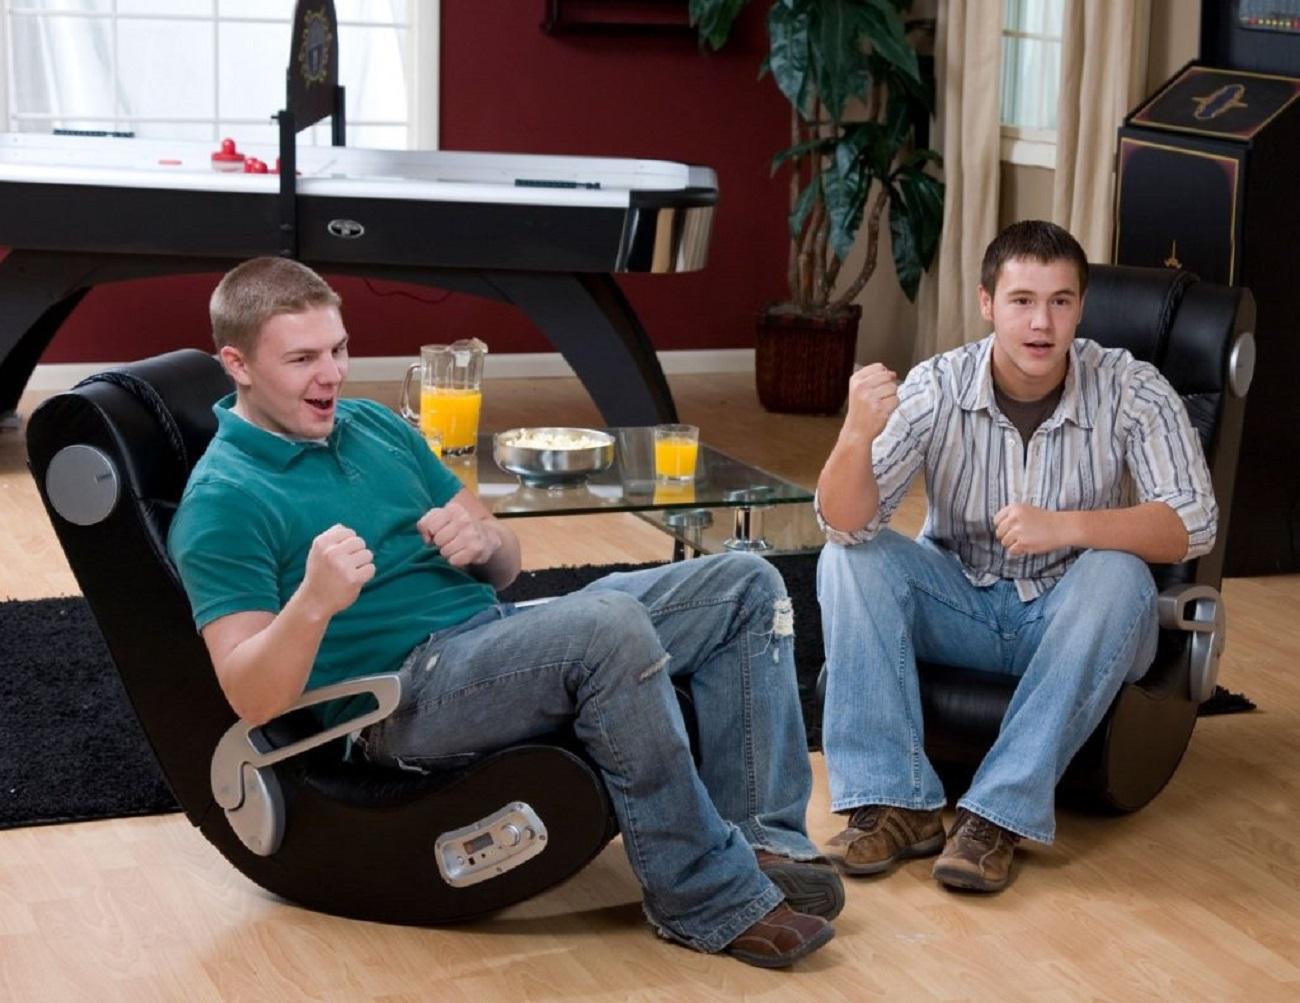 X+Rocker+II+Wireless+Video+Game+Chair